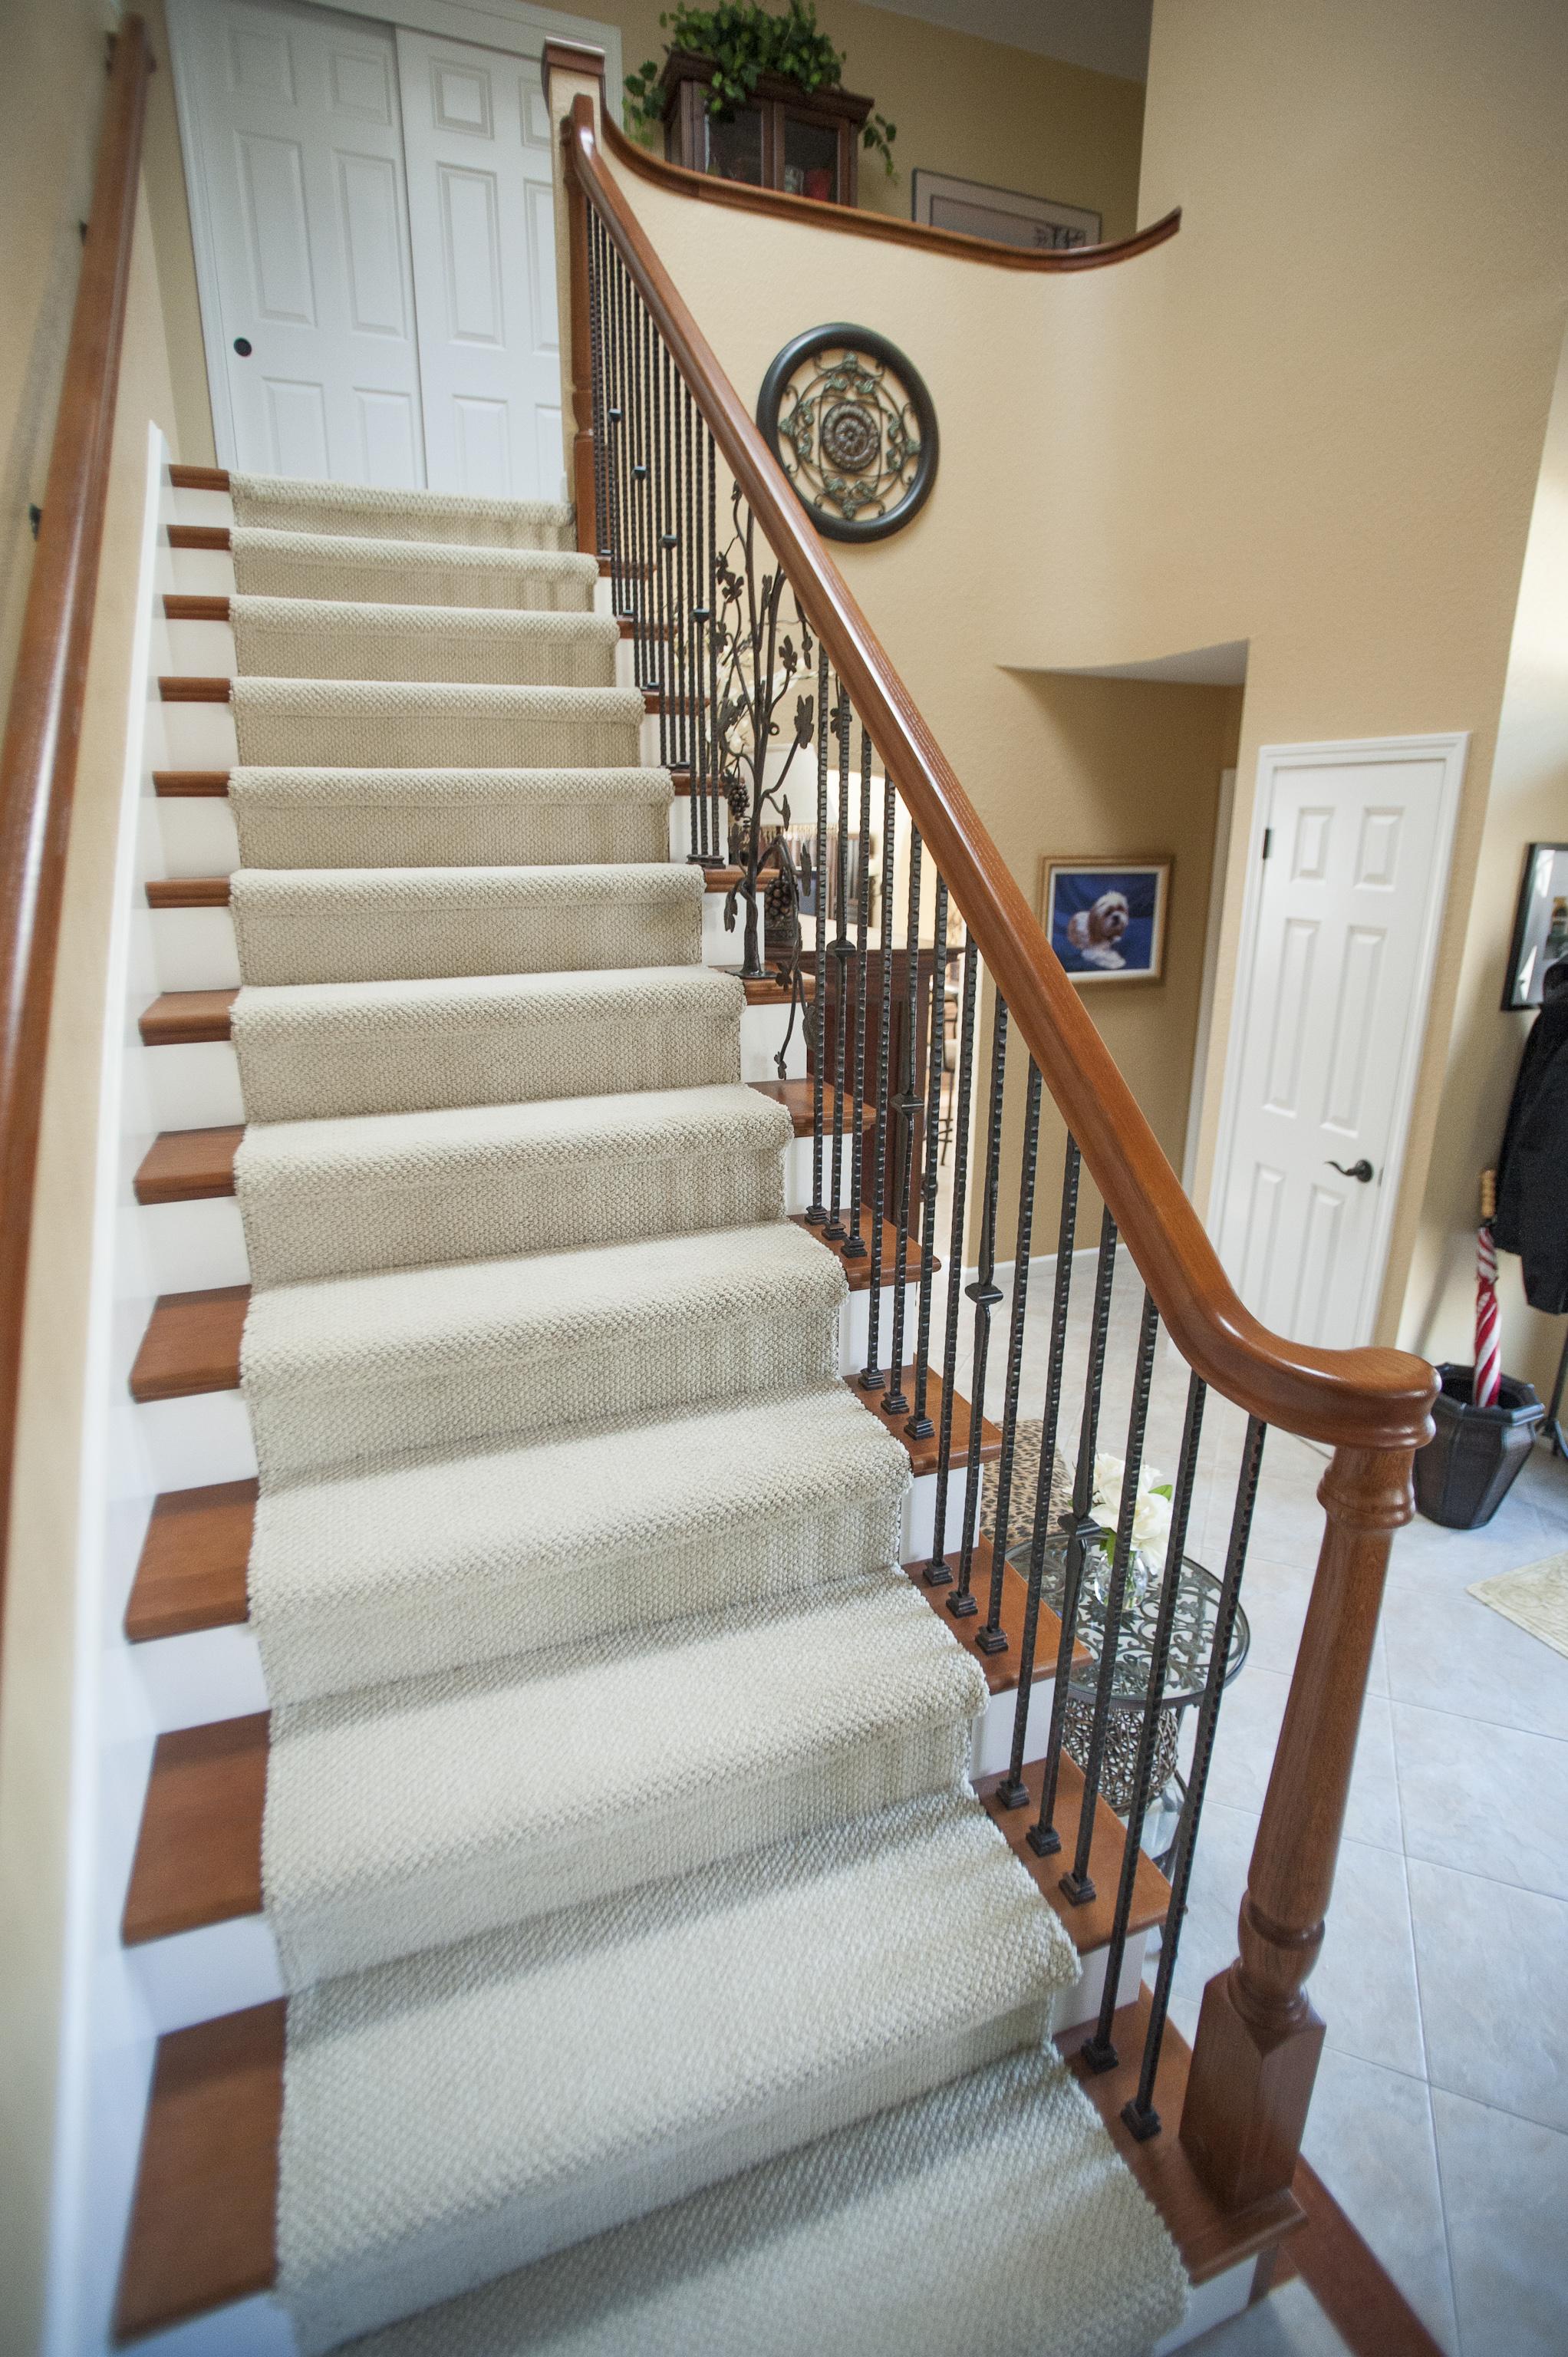 Staircase from below.jpg